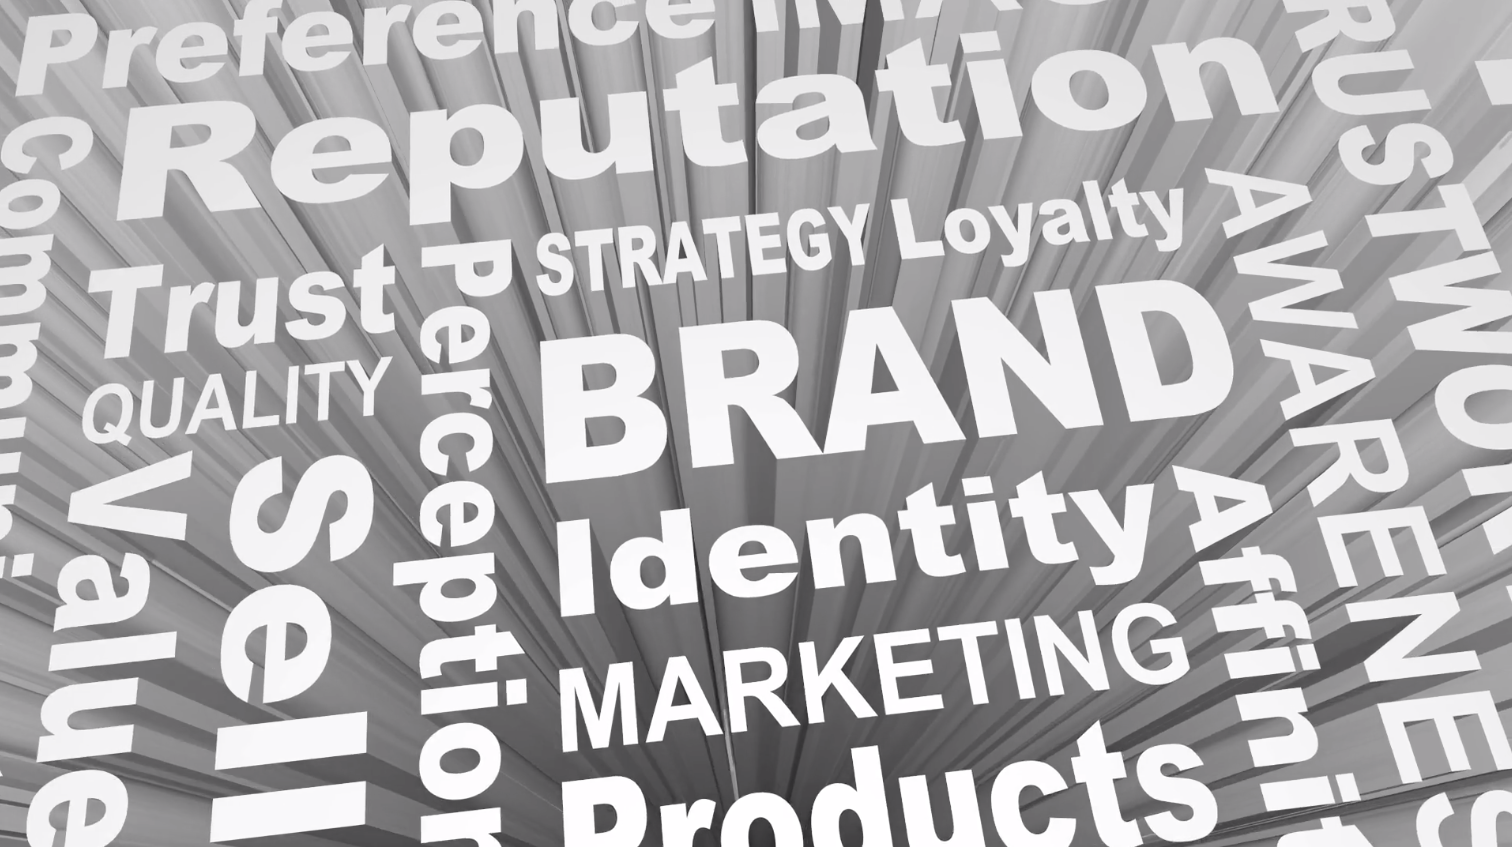 Themes For B2B Branding? -